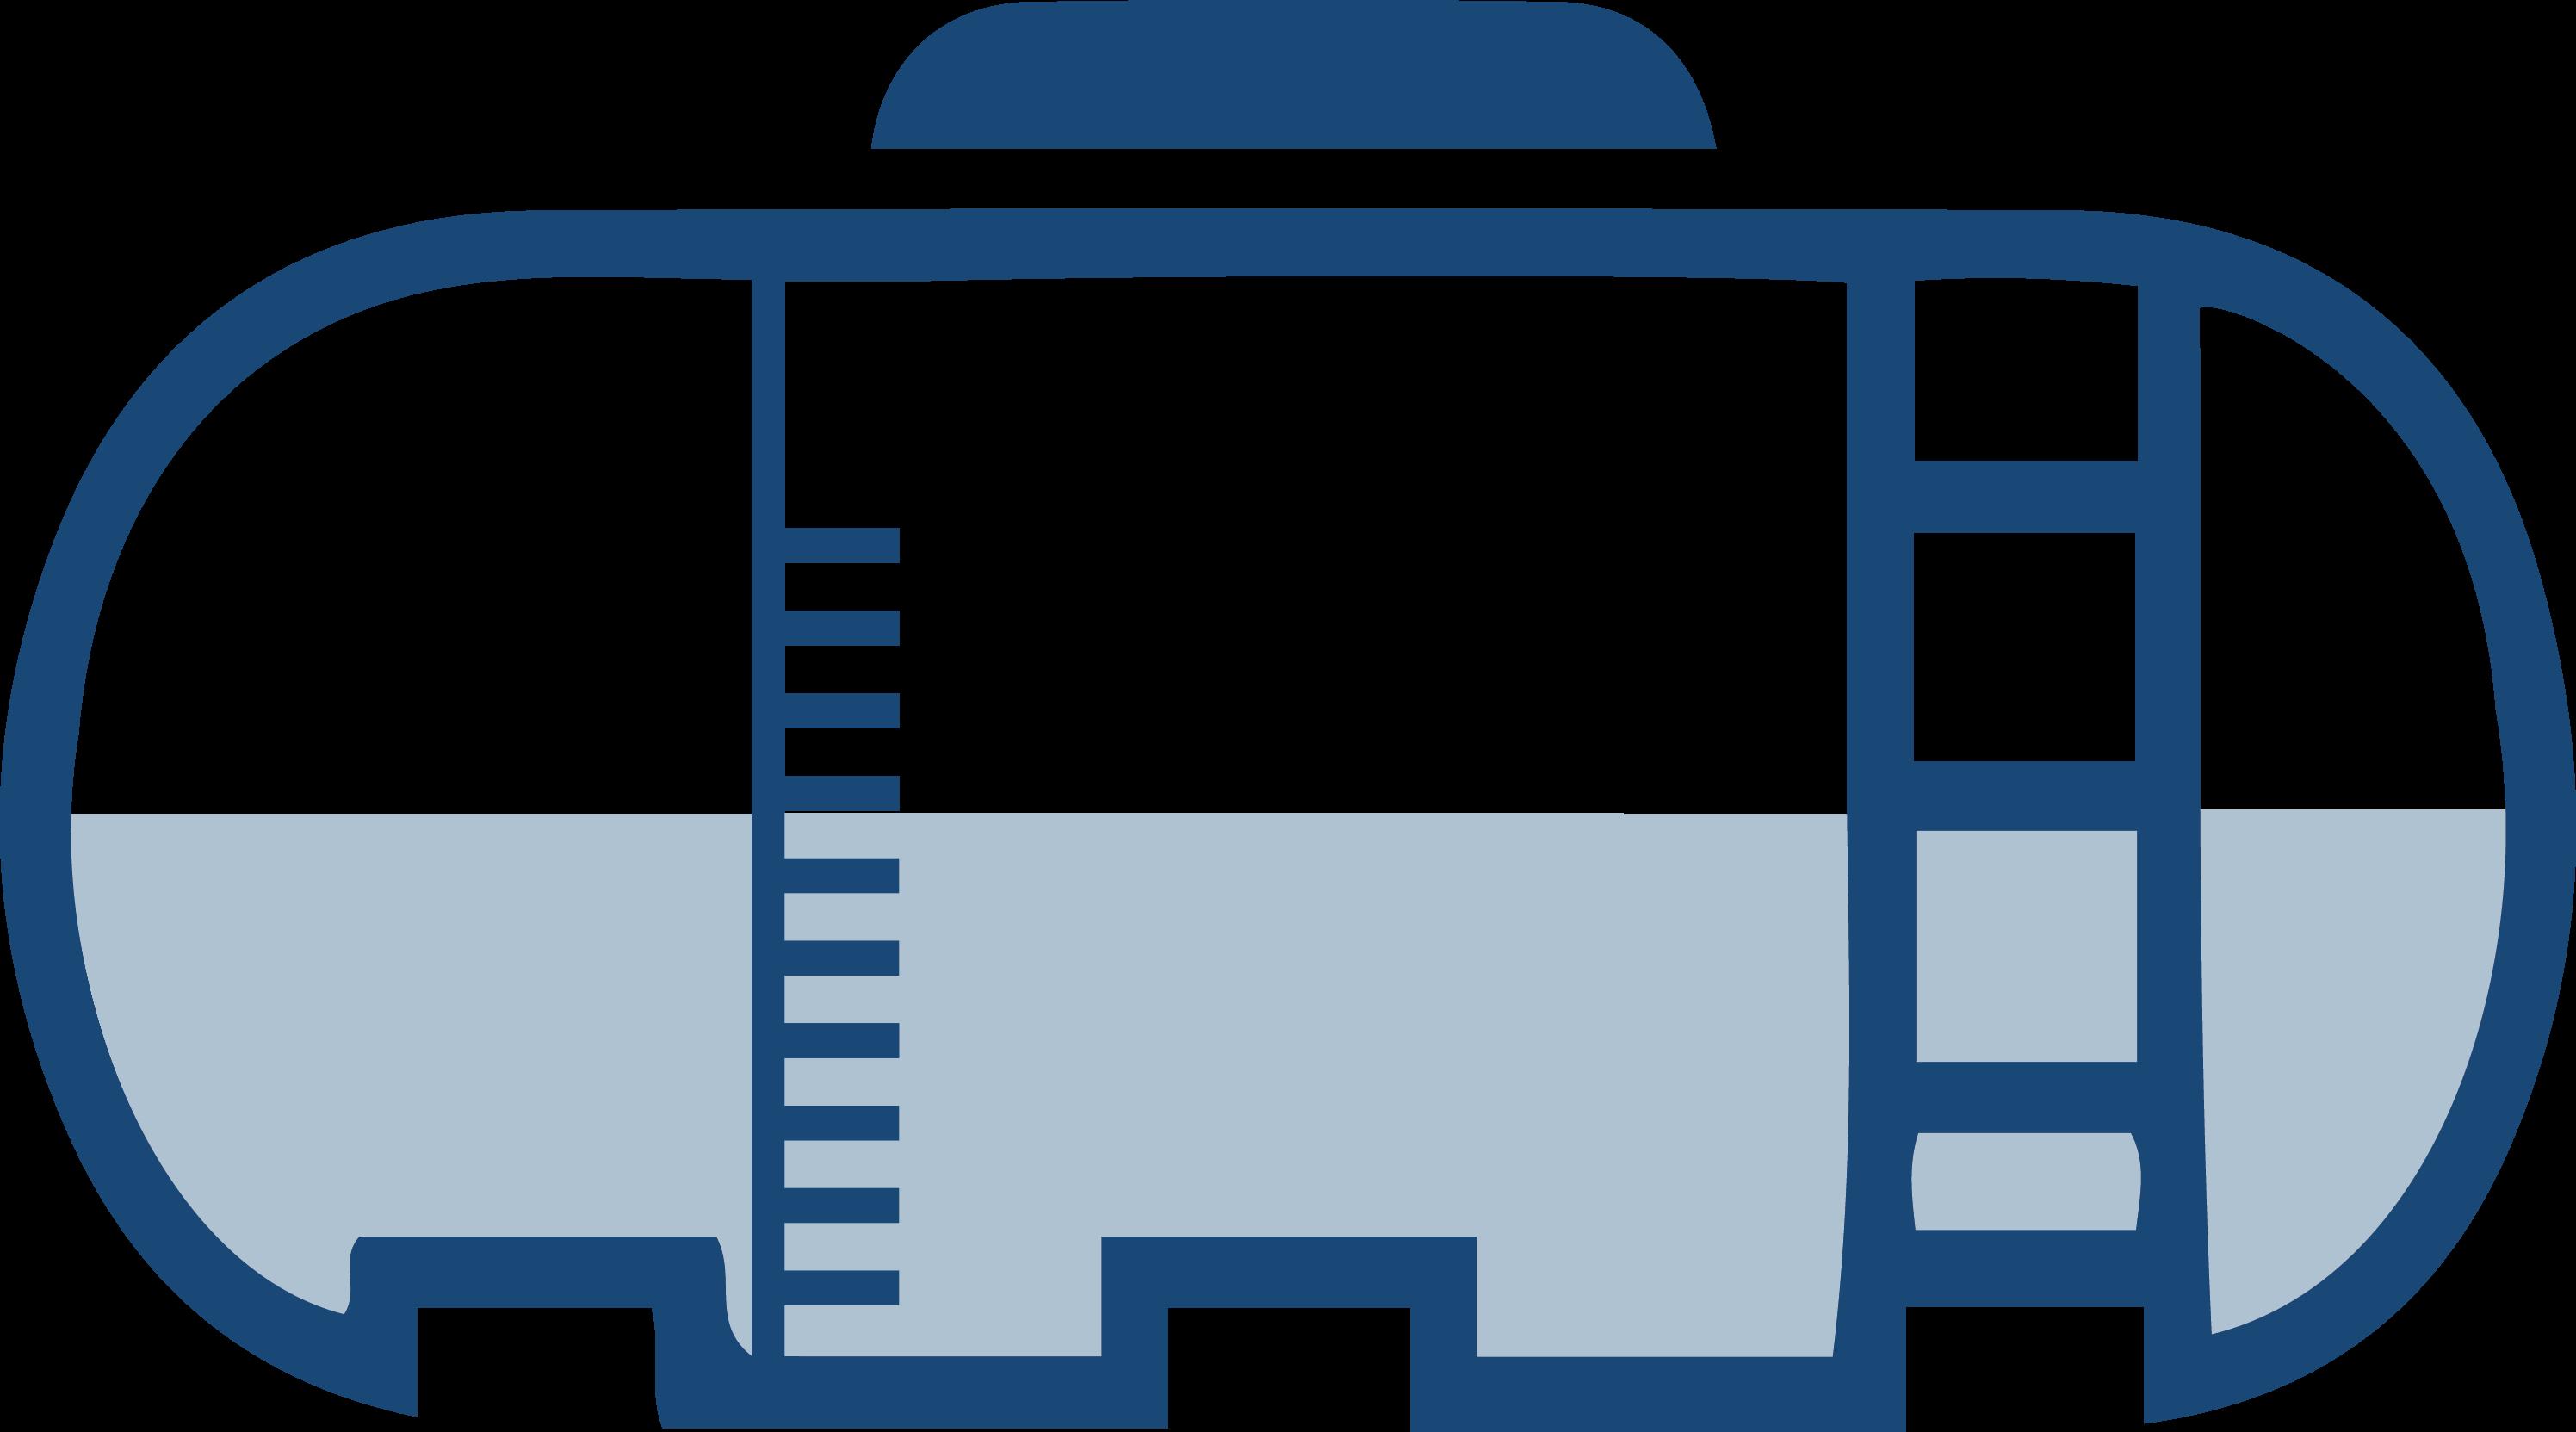 Fuel Tank PNG - 157283